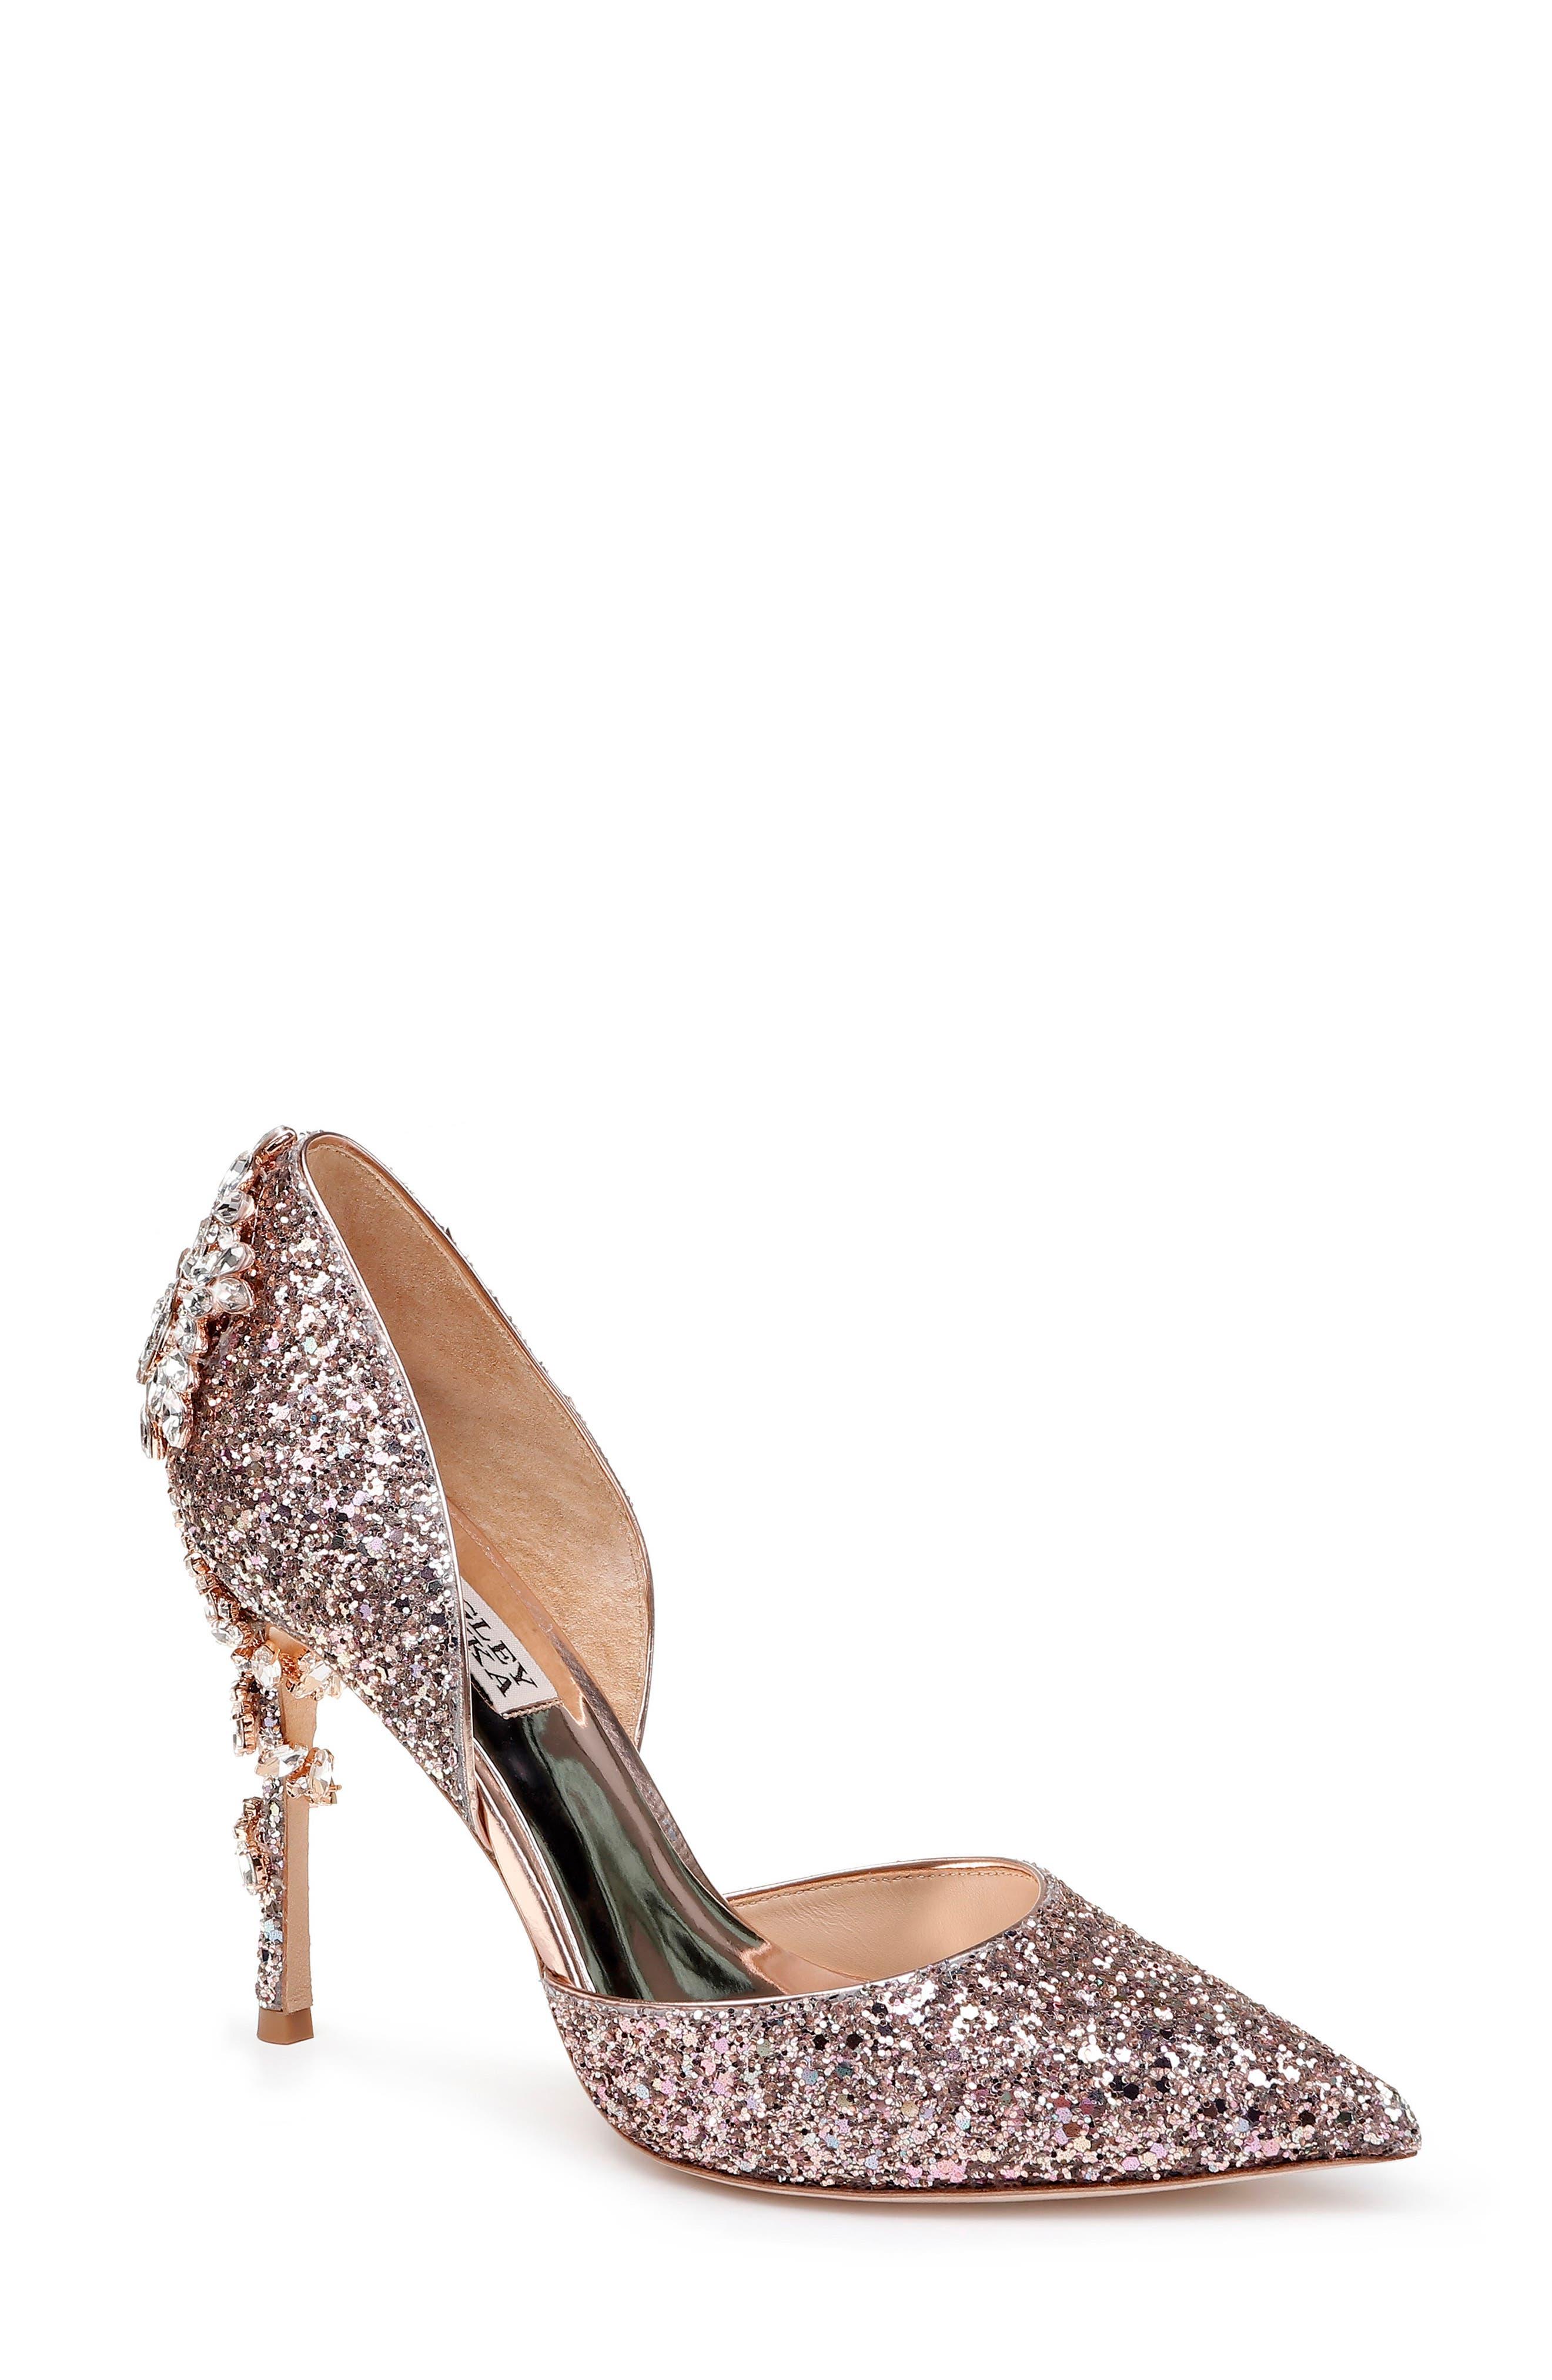 BADGLEY MISCHKA Vogue Iii Glitter Pumps in Rose Gold Glitter